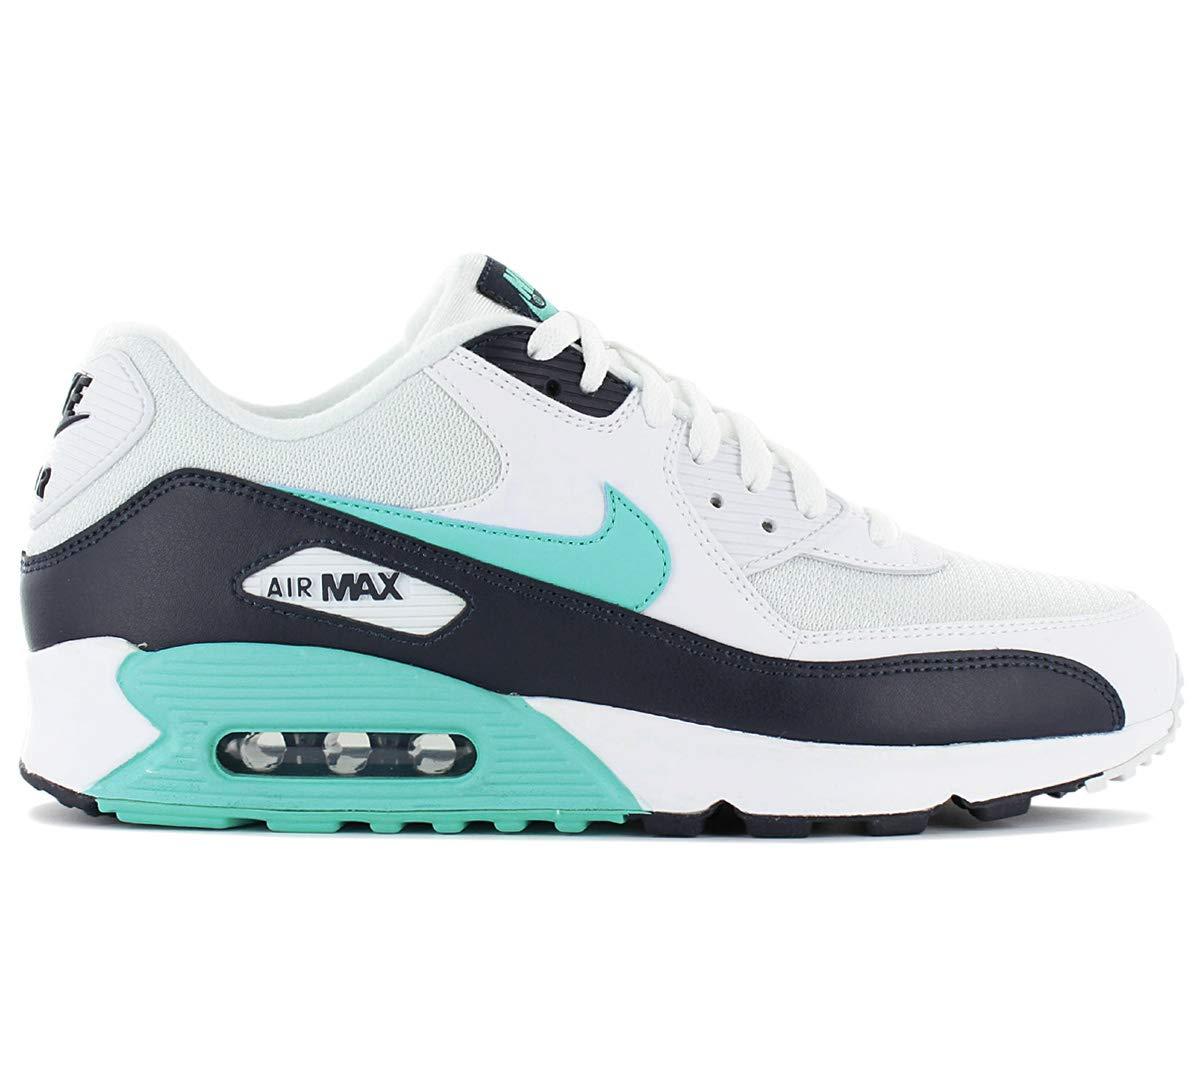 Nike Mens Air Max 90 Essential Running Shoes WhiteAurora GreenObsidian AJ1285 102 Size 8.5